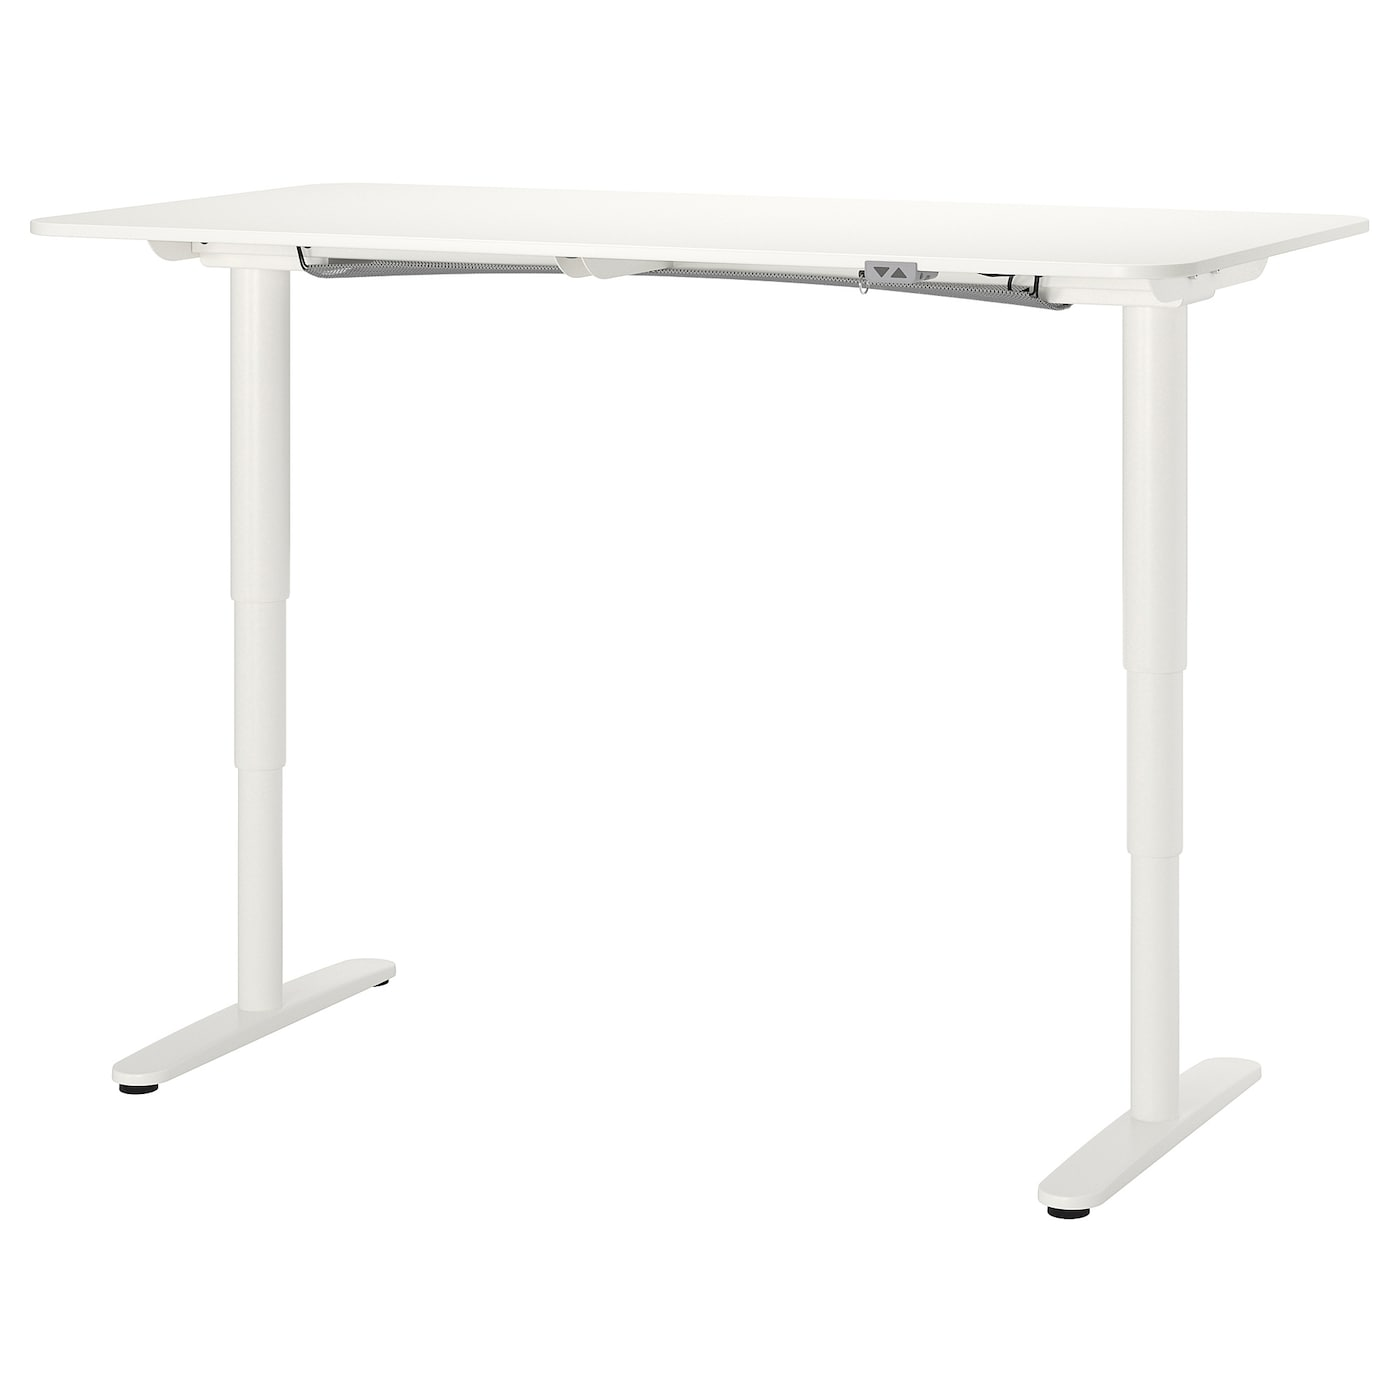 Ikea BEKANT Desk sit/stand, white, 63x31 1/2